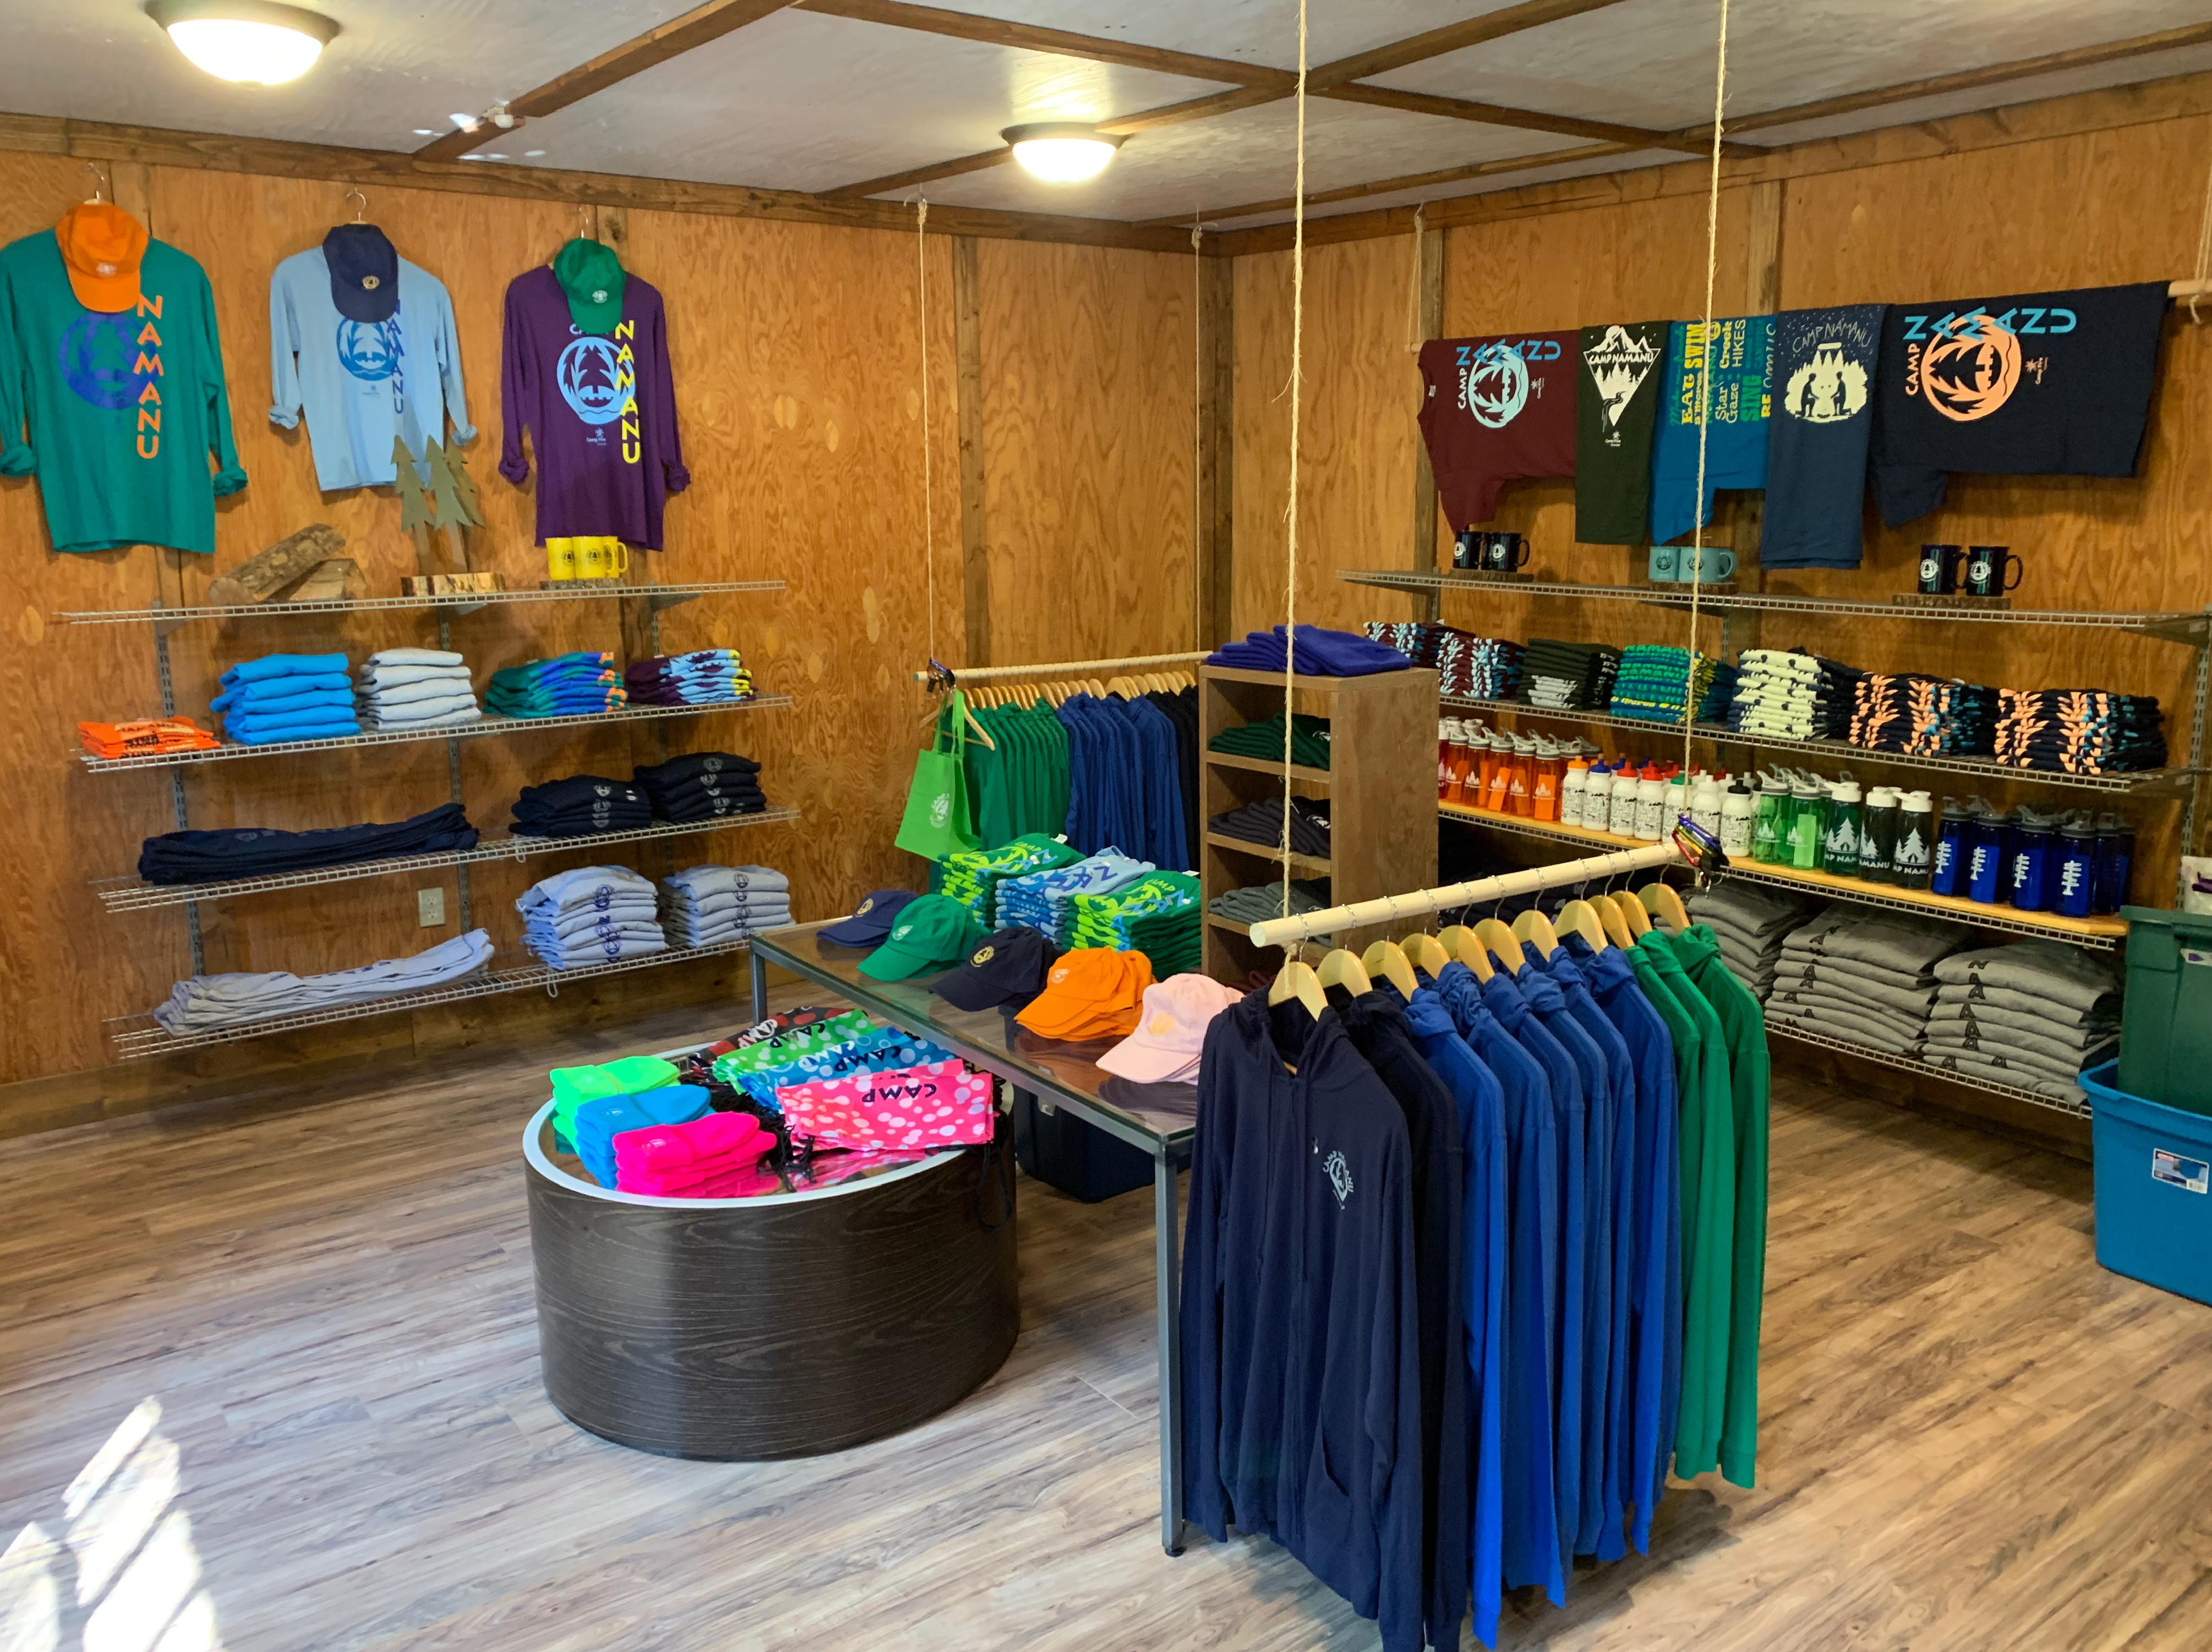 Camp Naumanu newly renovated camp store and welcome center.